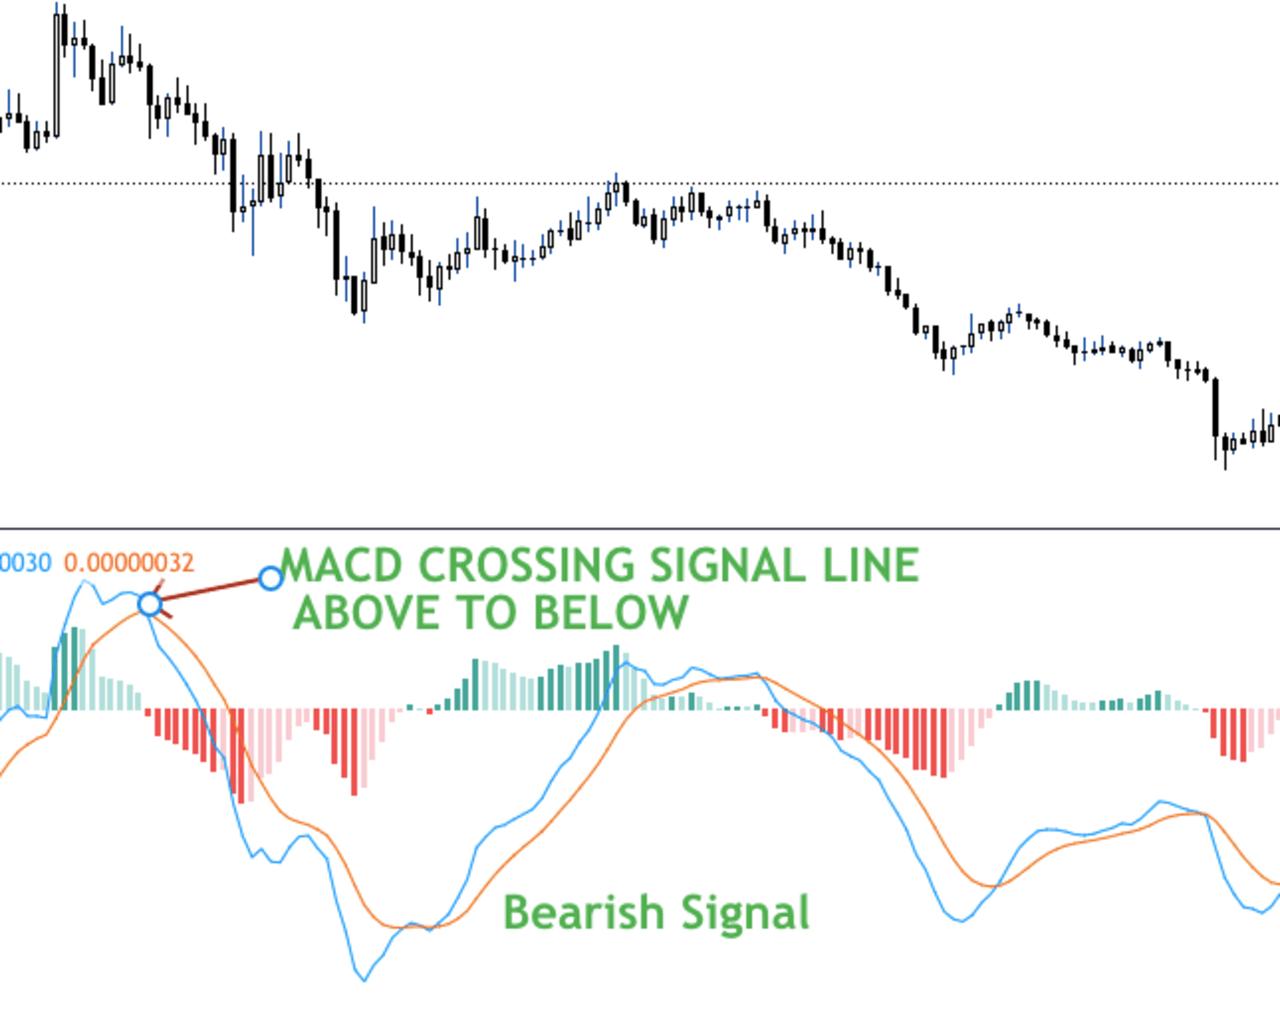 MACD signal